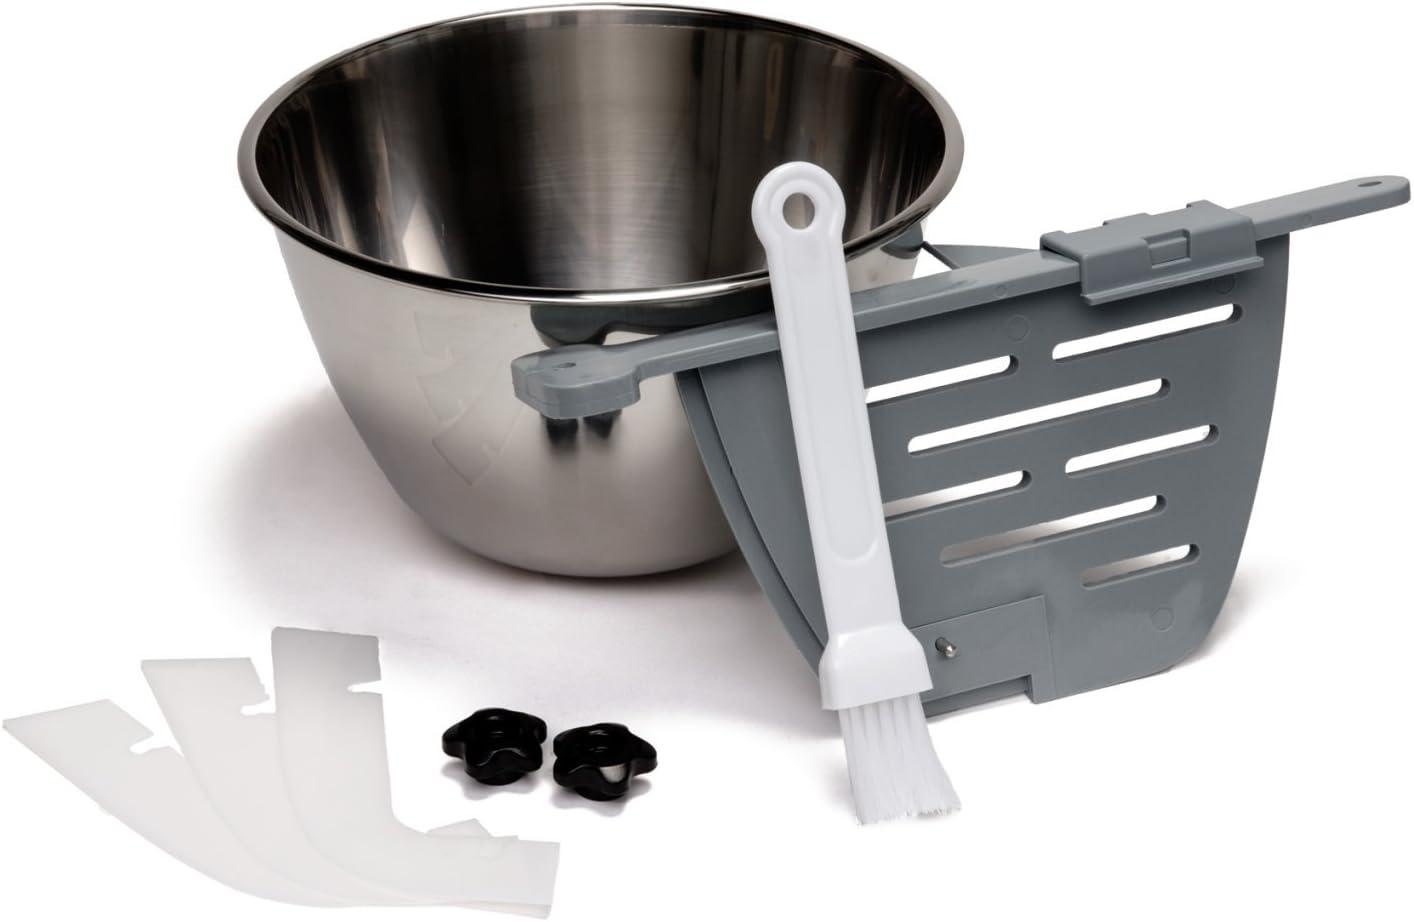 Gray ChocoVision 5024 Machine Accessory Kit for Revolation-V